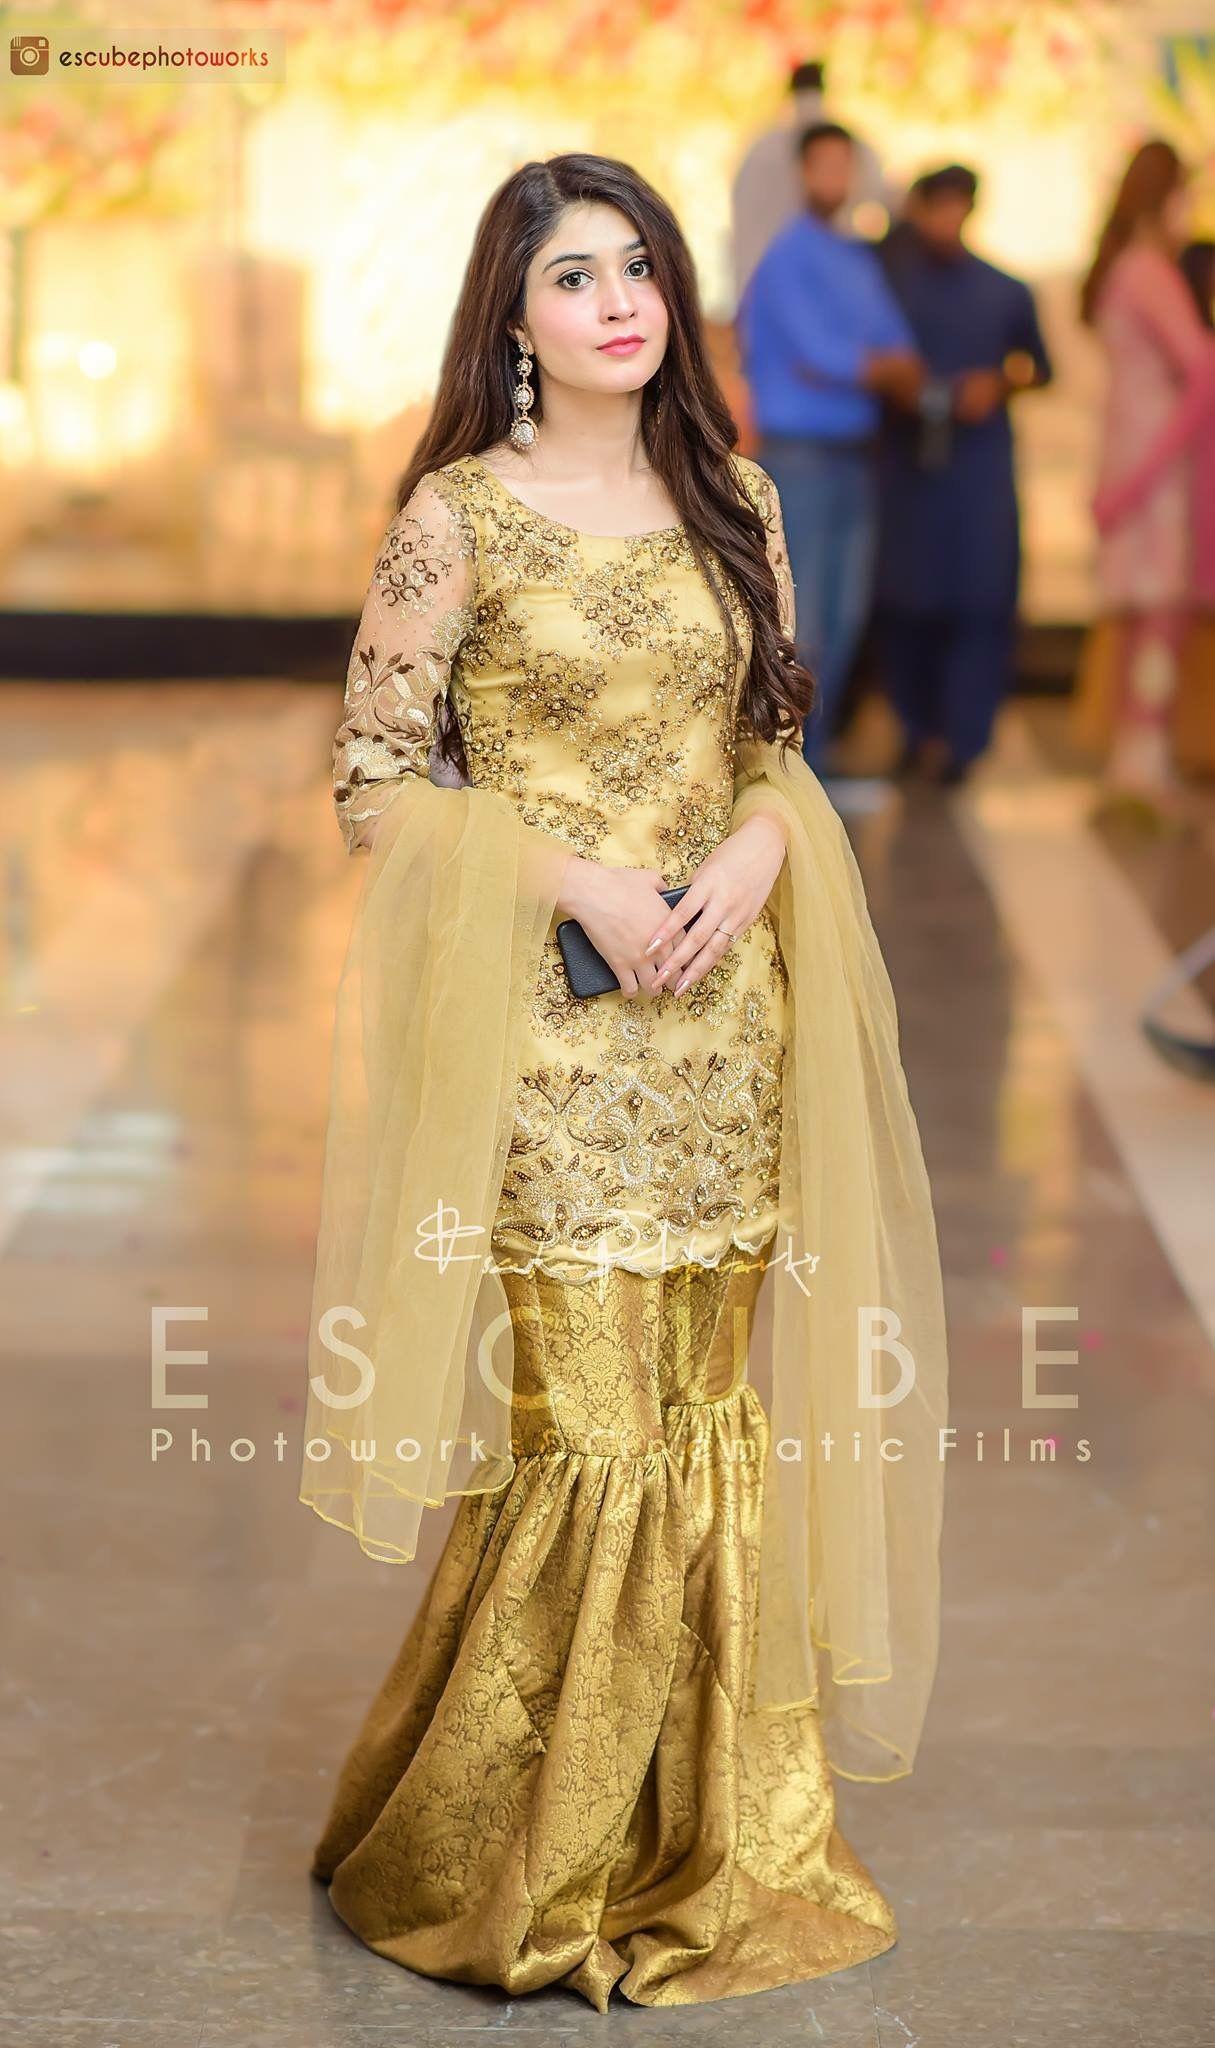 Pin By Jowairiah Ahmad On Shadi Dresses In 2019 Dresses Pakistani